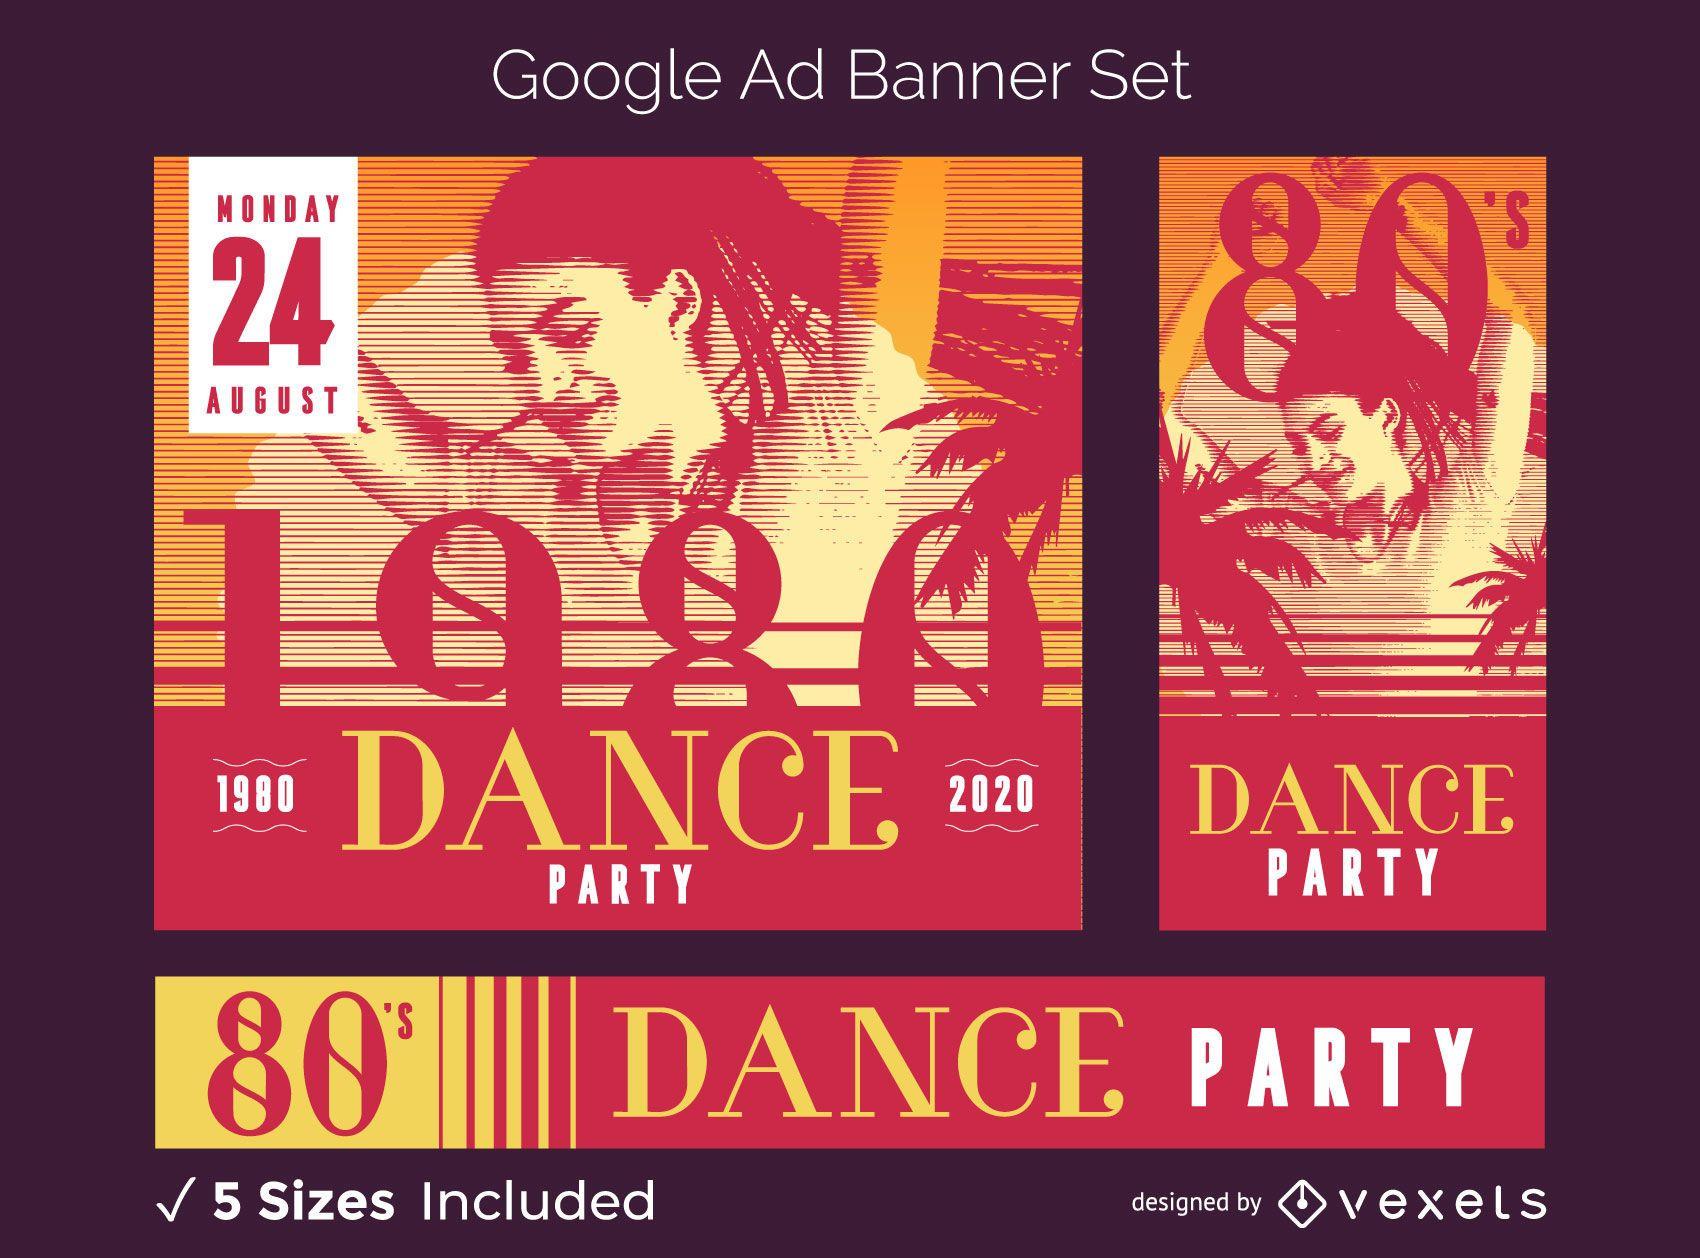 Retro party ad banner set